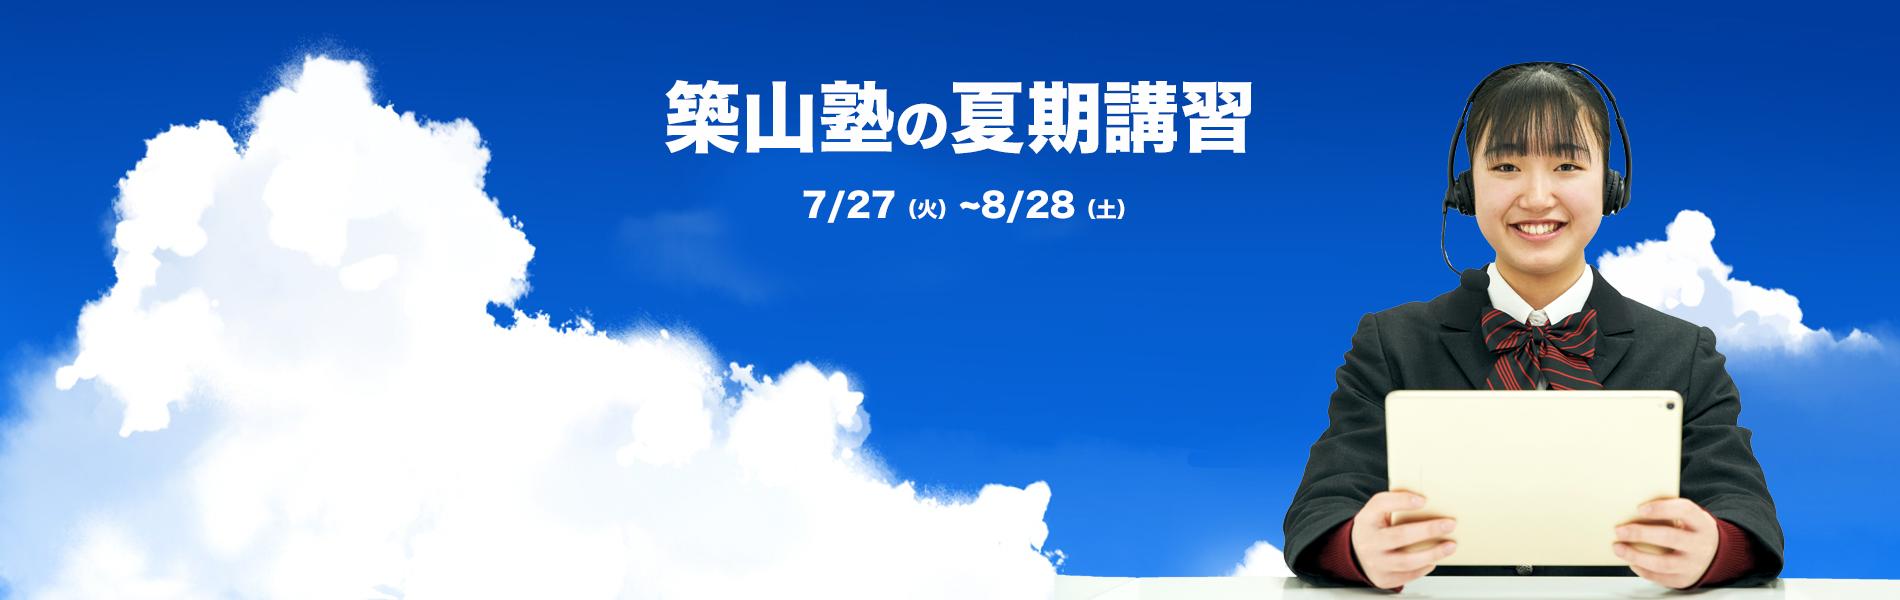 築山塾の夏期講習